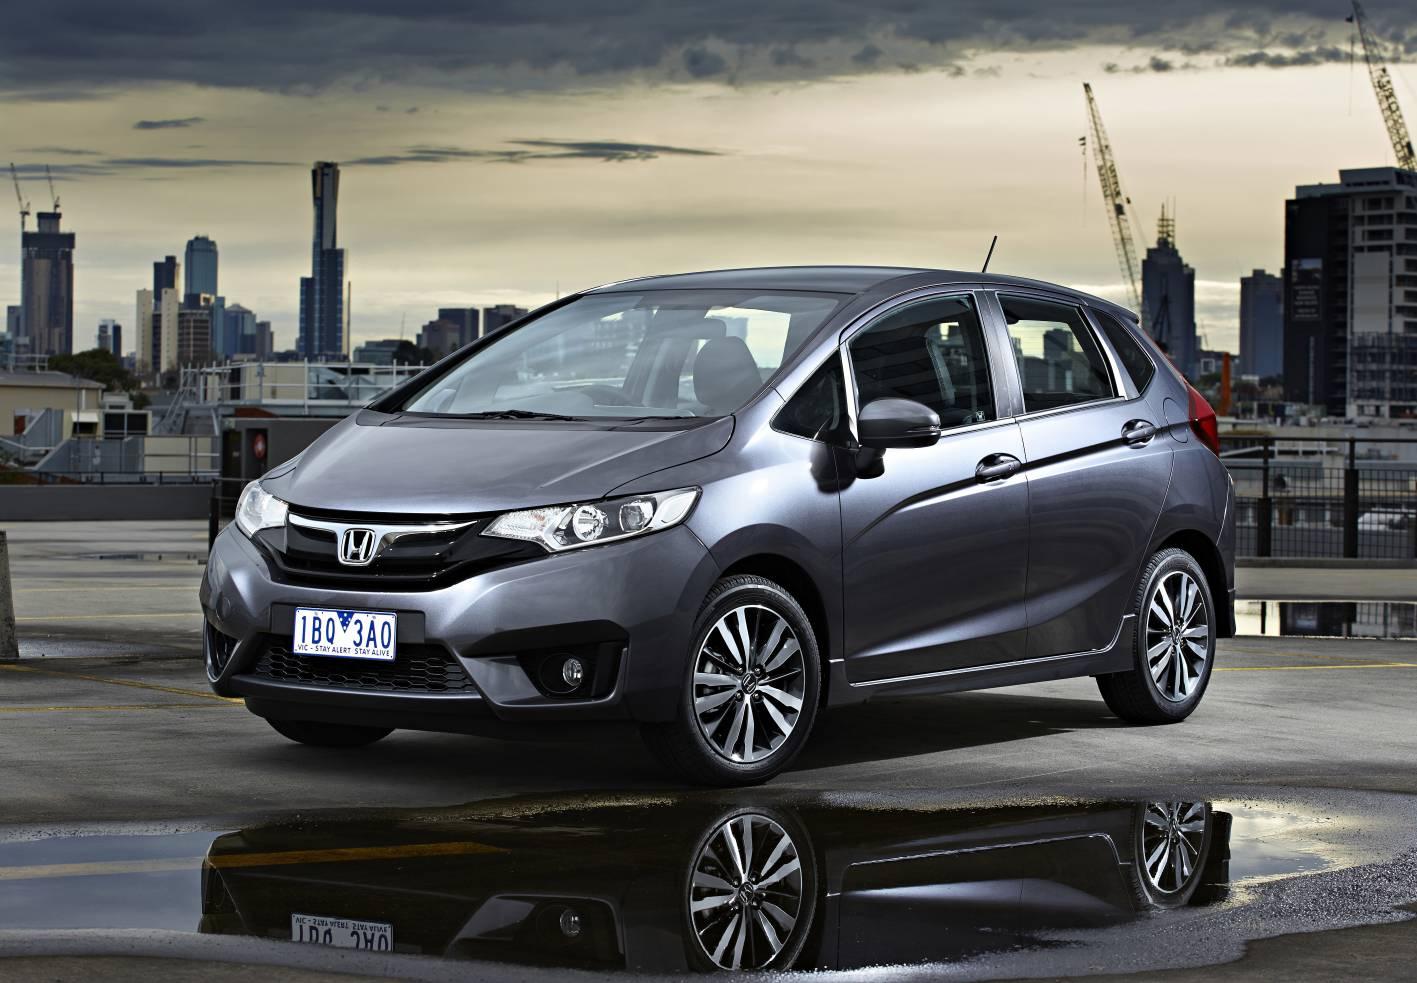 2015 Honda Jazz Front Quarter